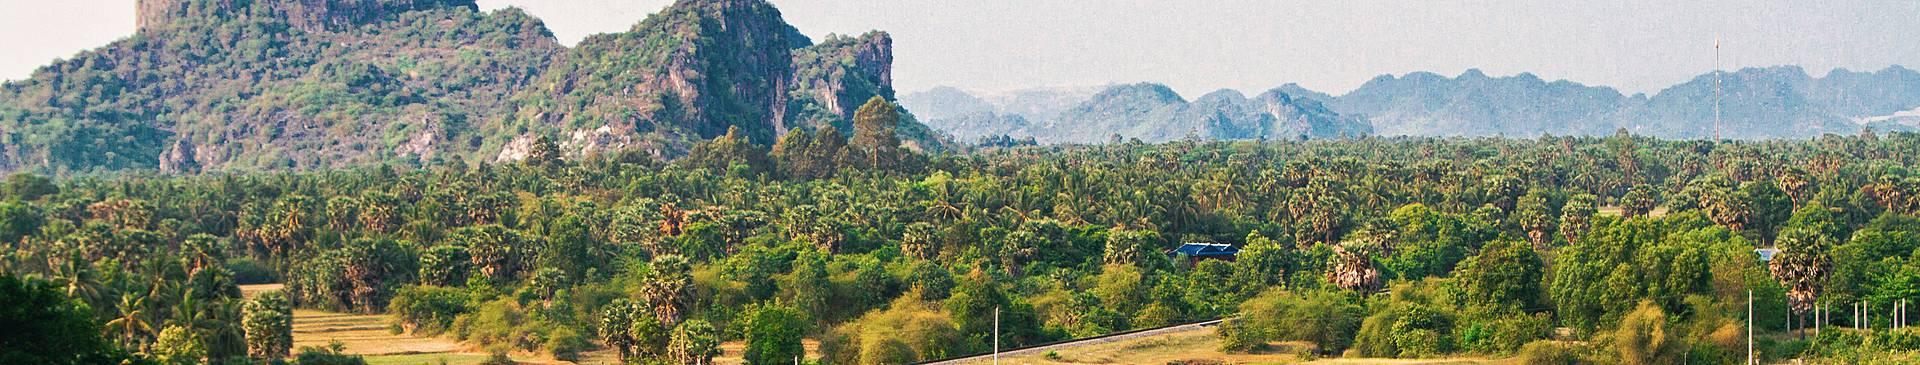 Naturreisen Kambodscha